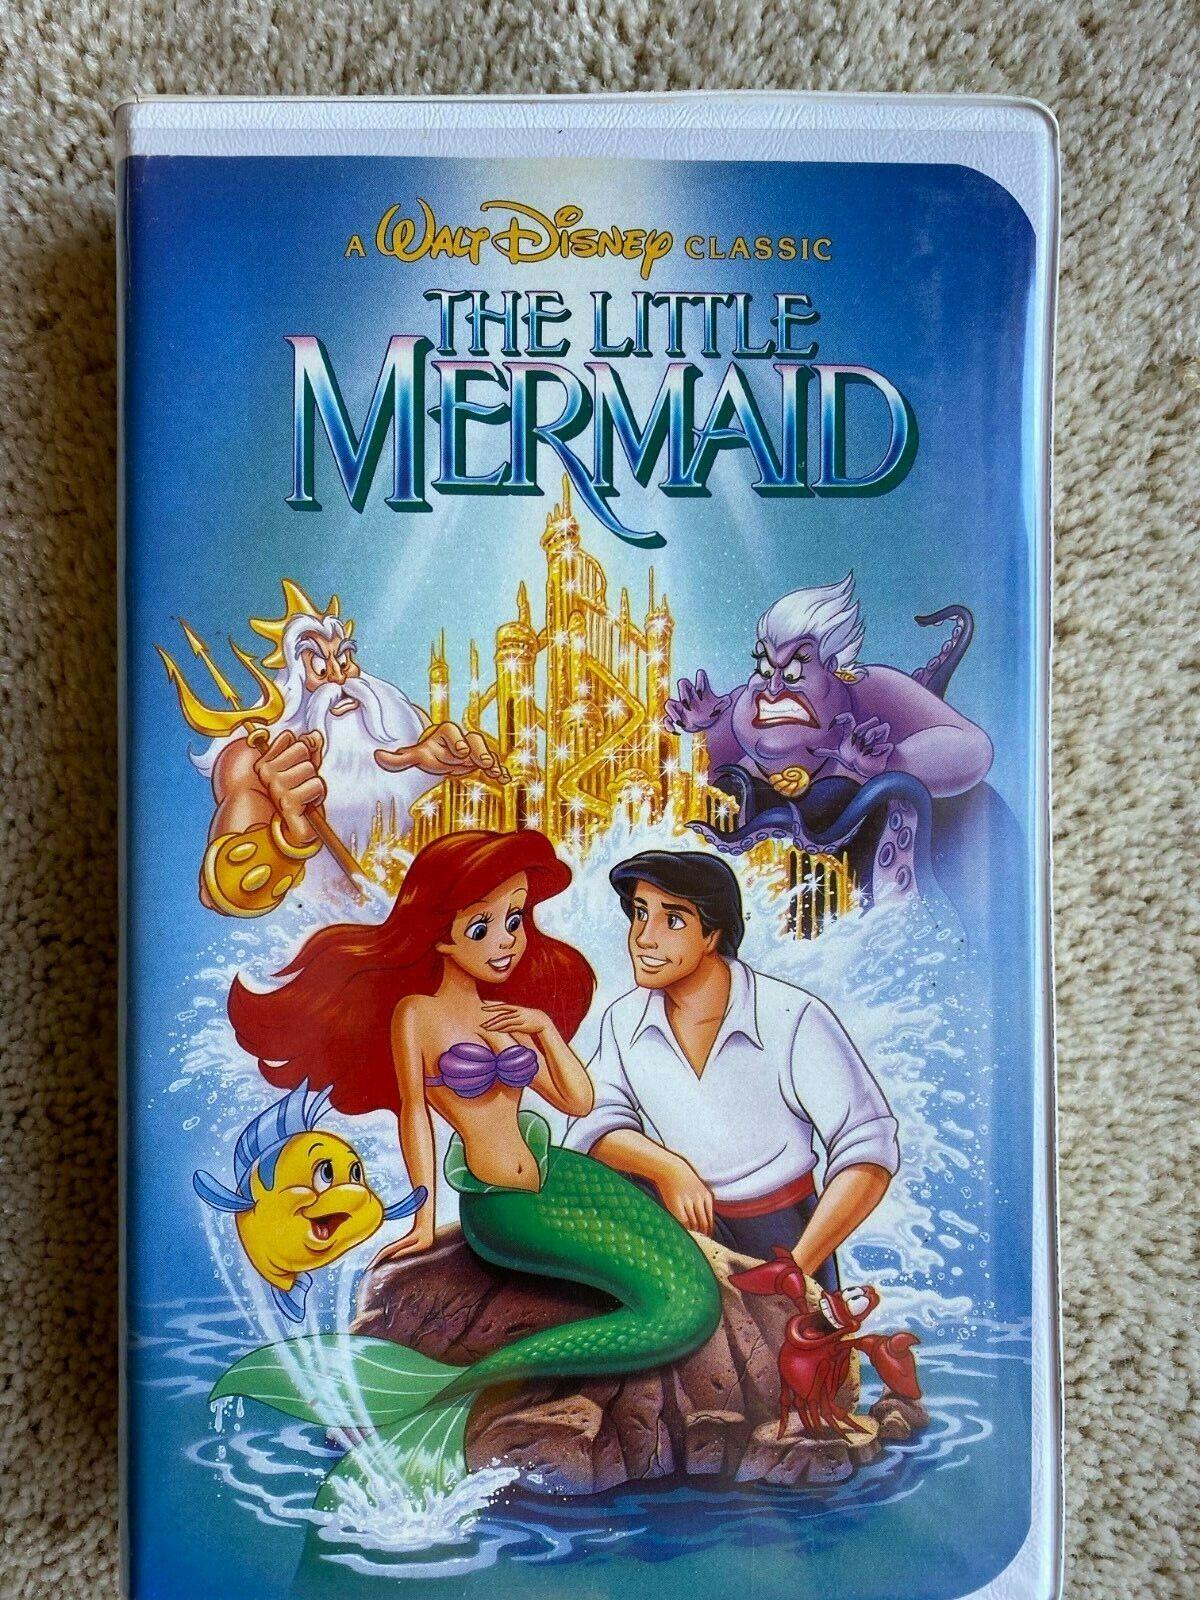 The Little Mermaid VHS, 1990 Black Diamond Edition - Very Good Condition - $24.95